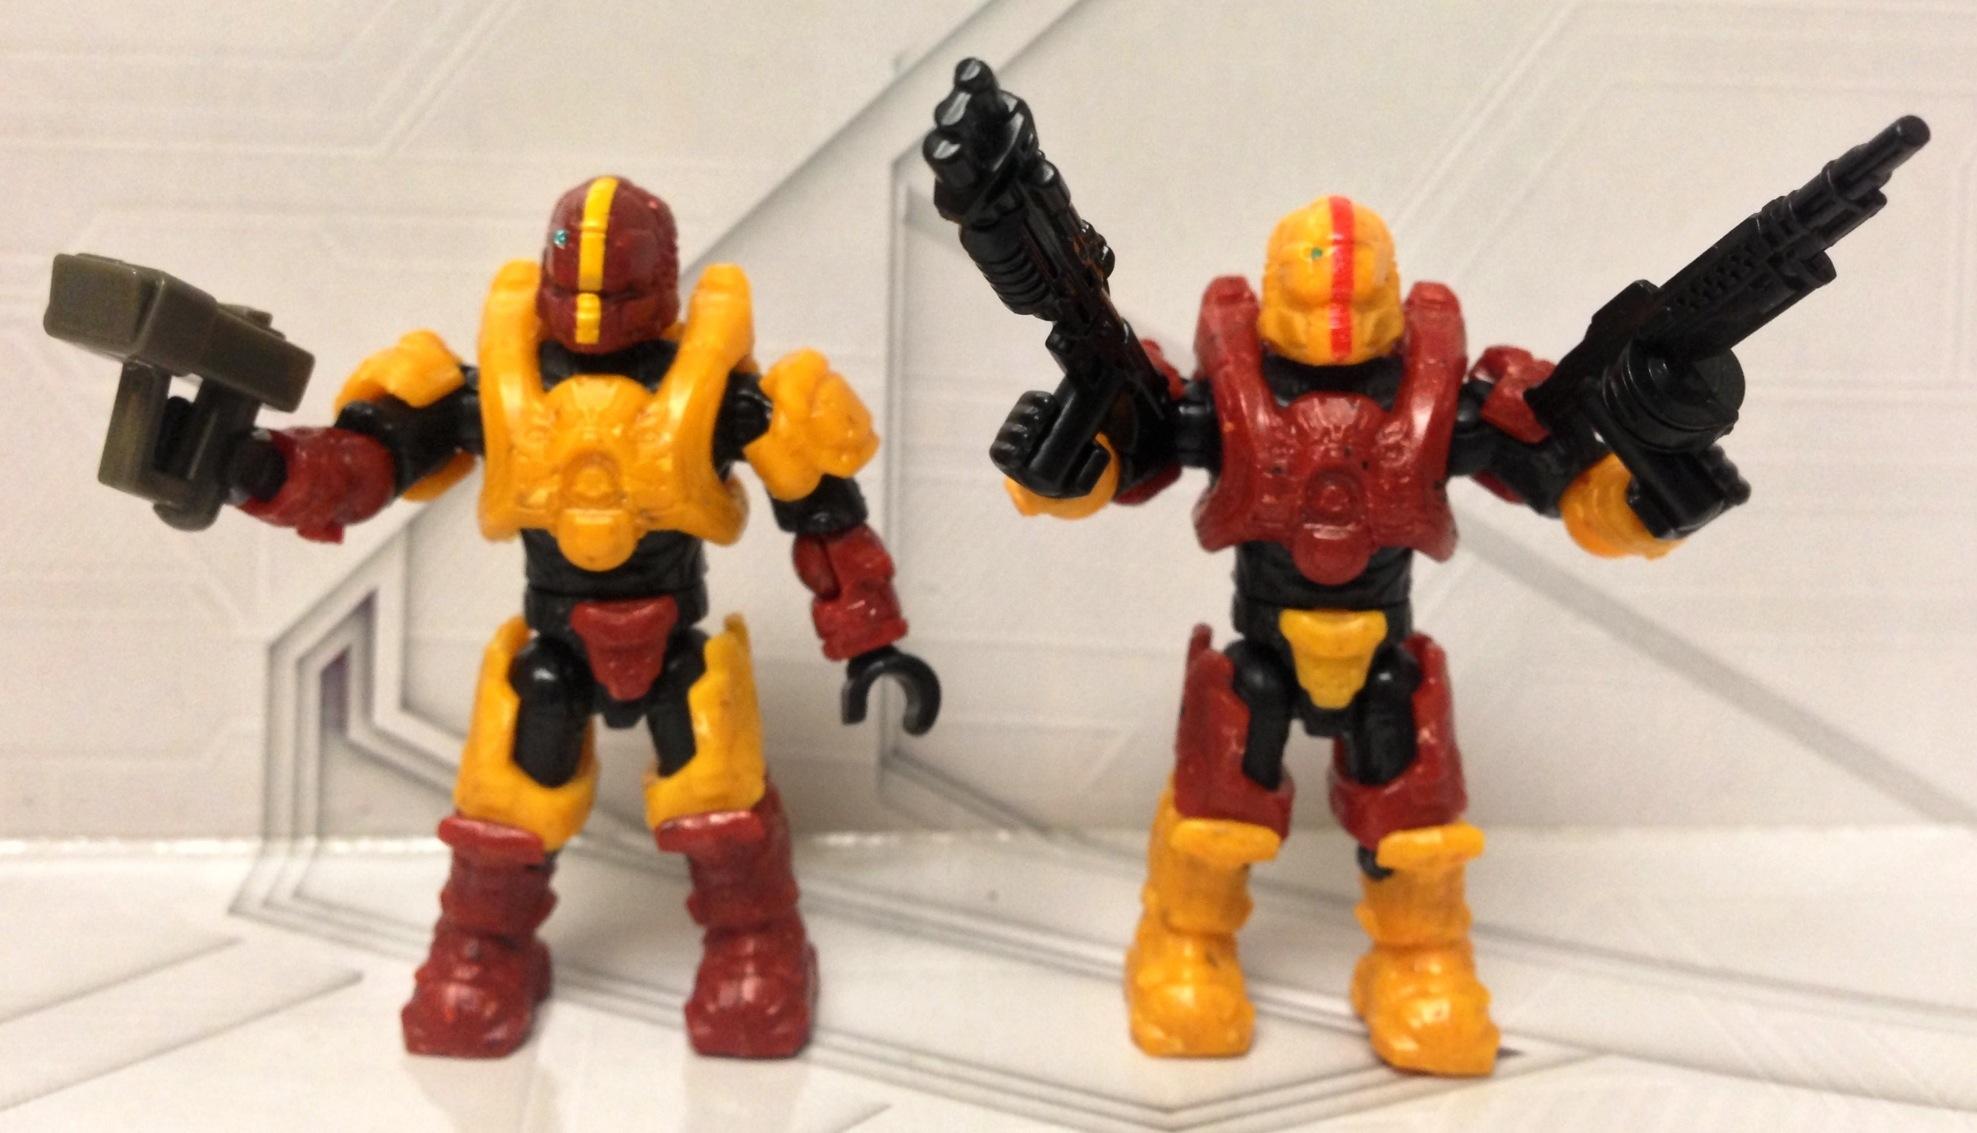 Halo Mega Bloks UNSC Flame Warthog Review & Photos - Halo Toy News